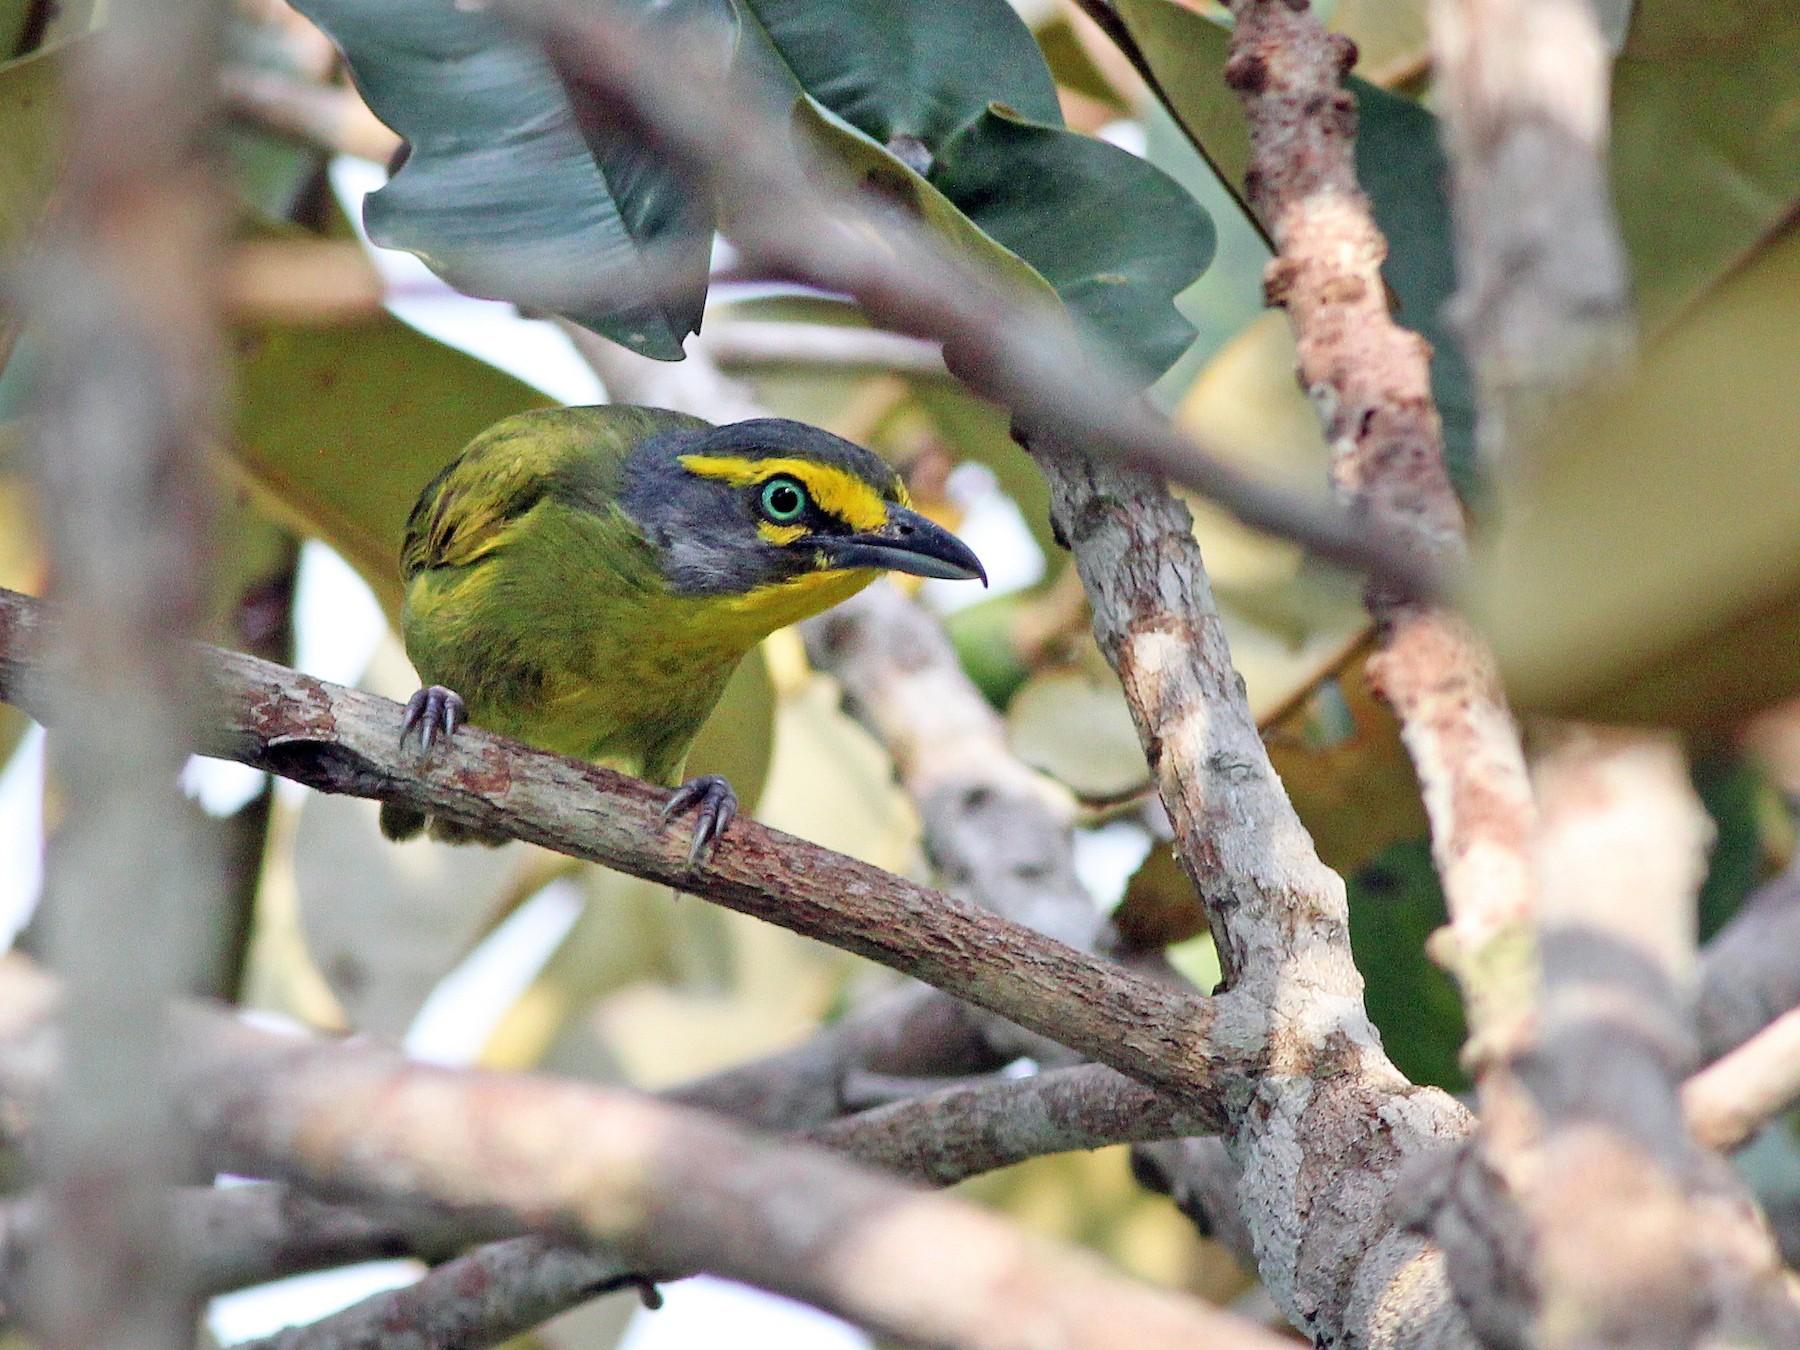 Slaty-capped Shrike-Vireo - Nárgila Moura